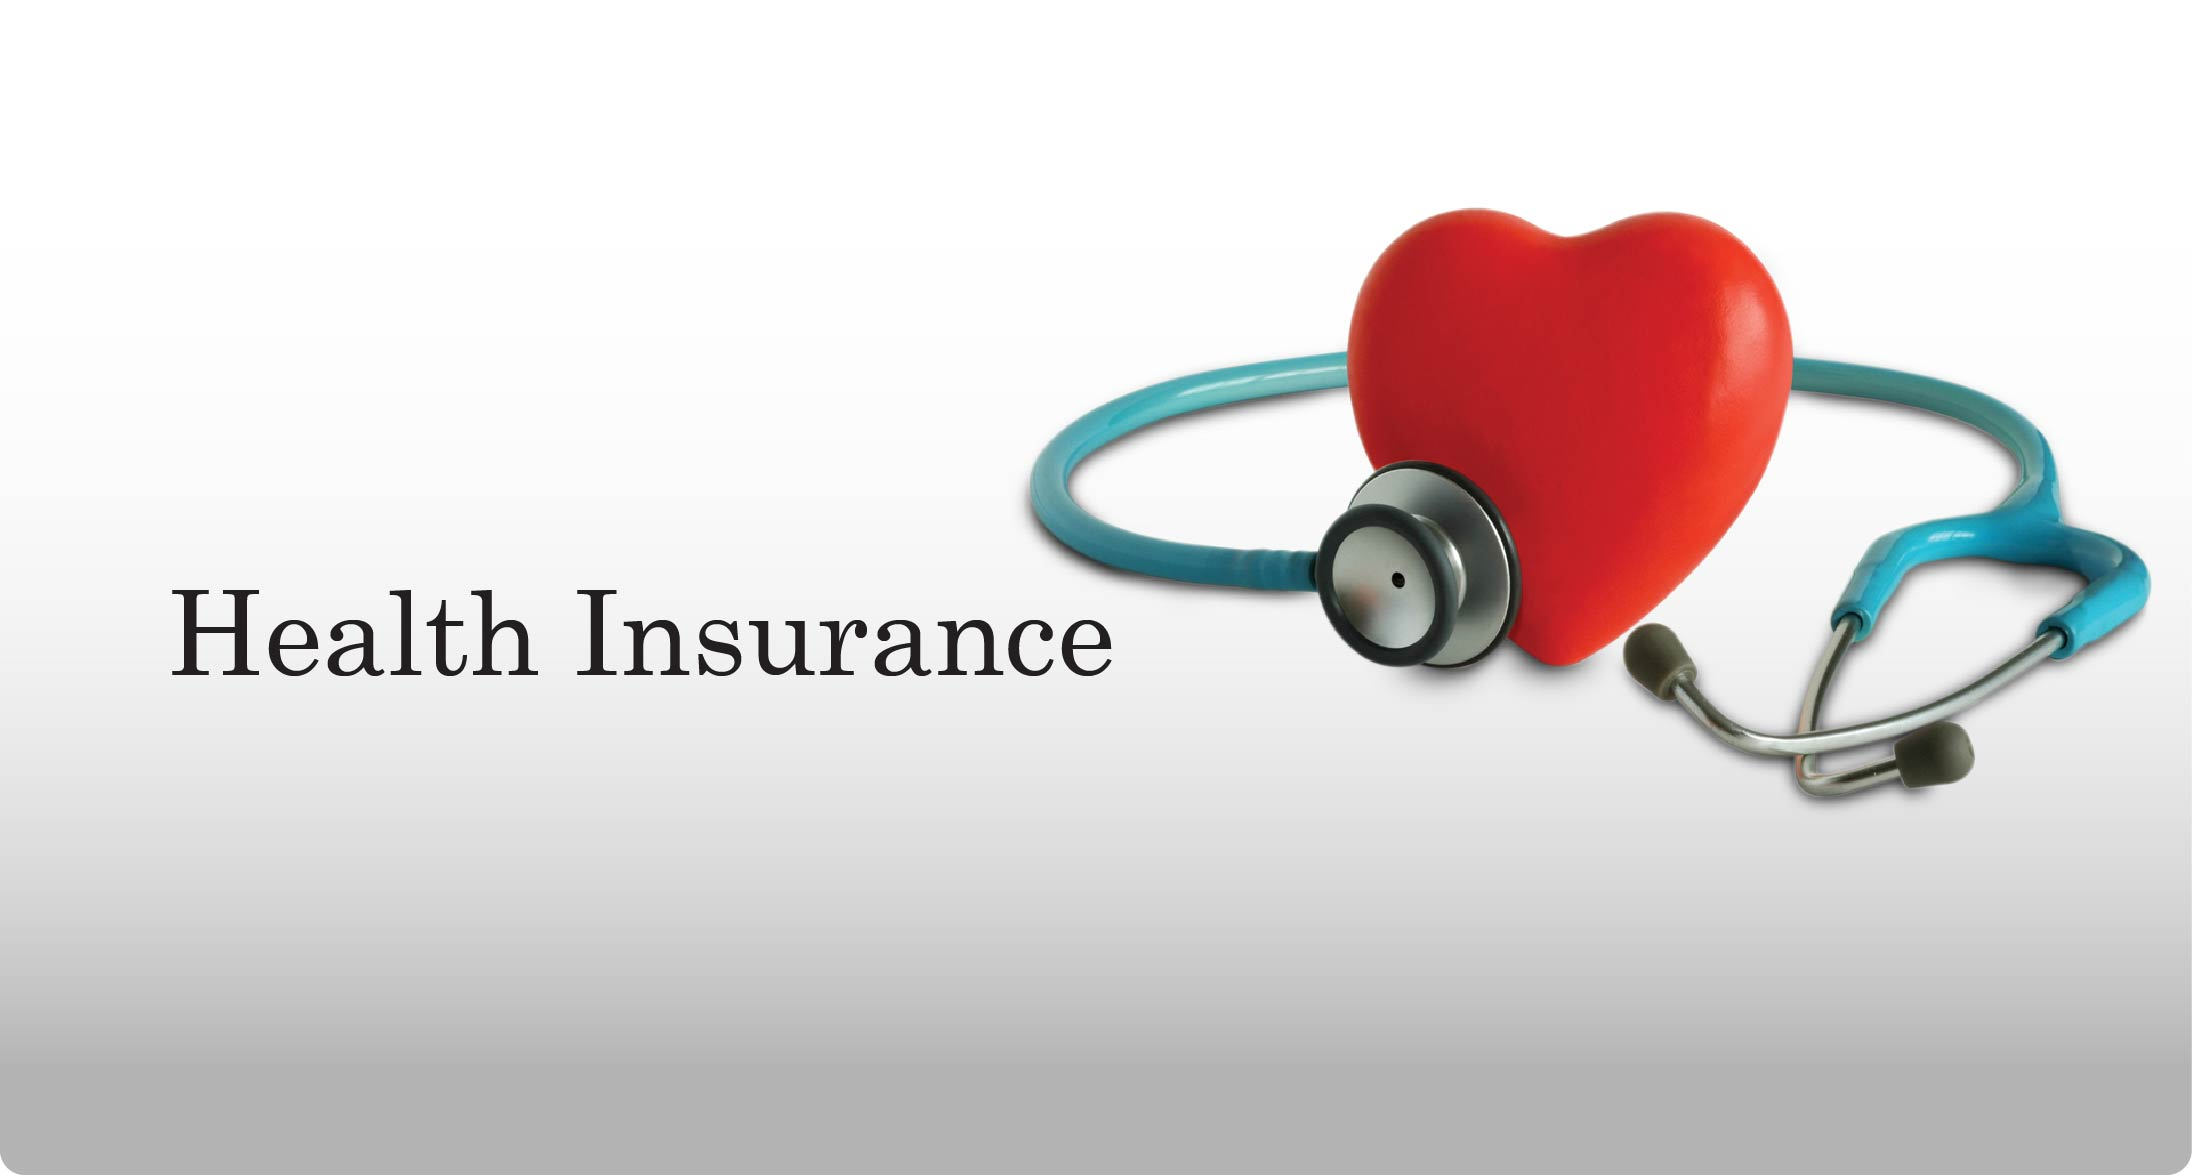 health-insurance.jpg (2192×1175)